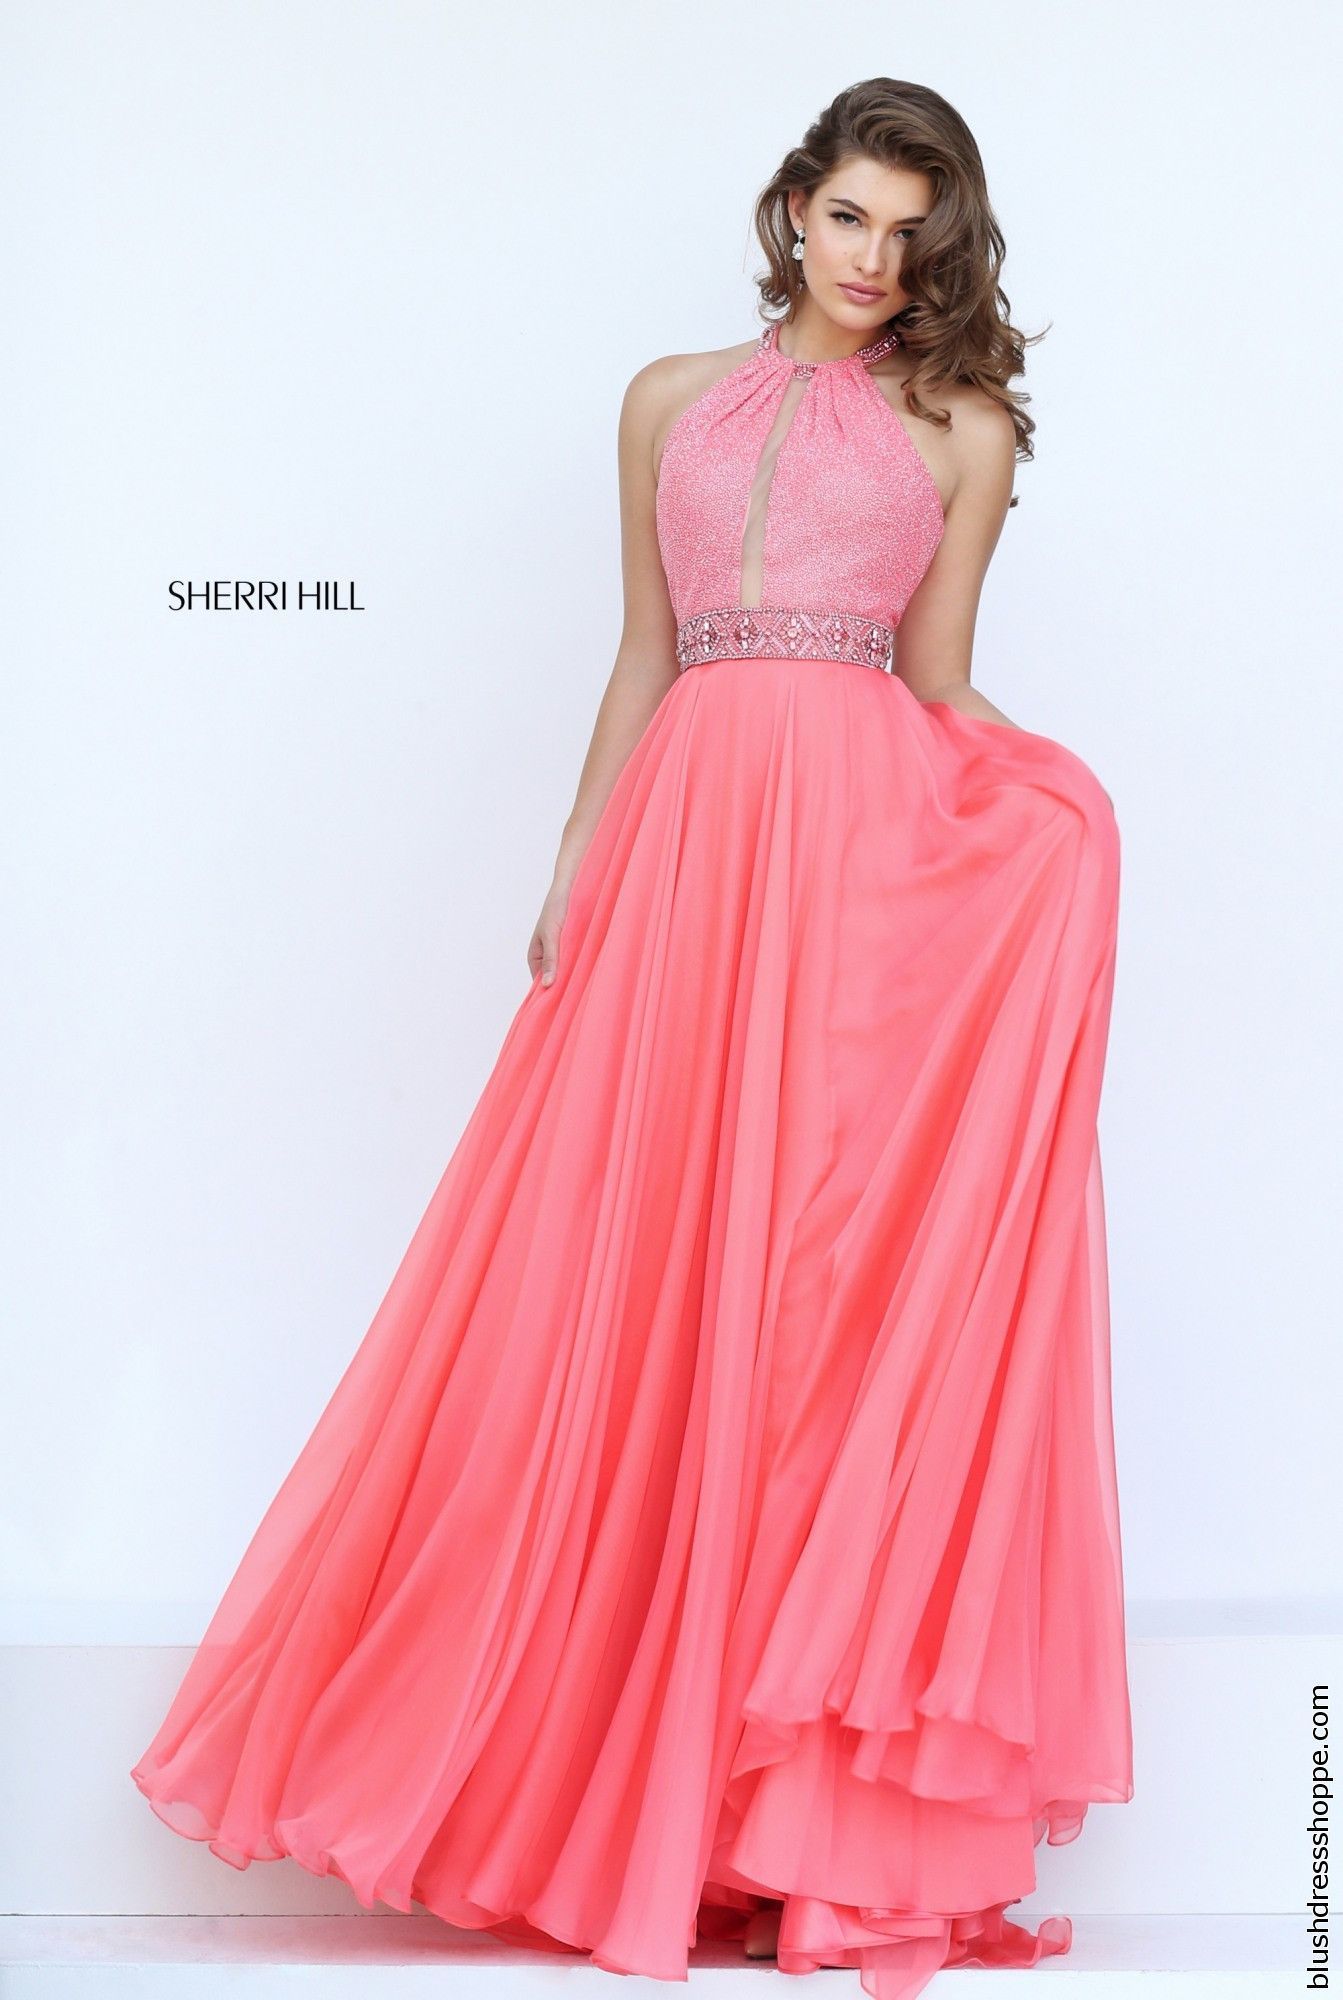 Sherri Hill 50454 | Prom | Pinterest | Dios es mi fuerza, Dios es y ...